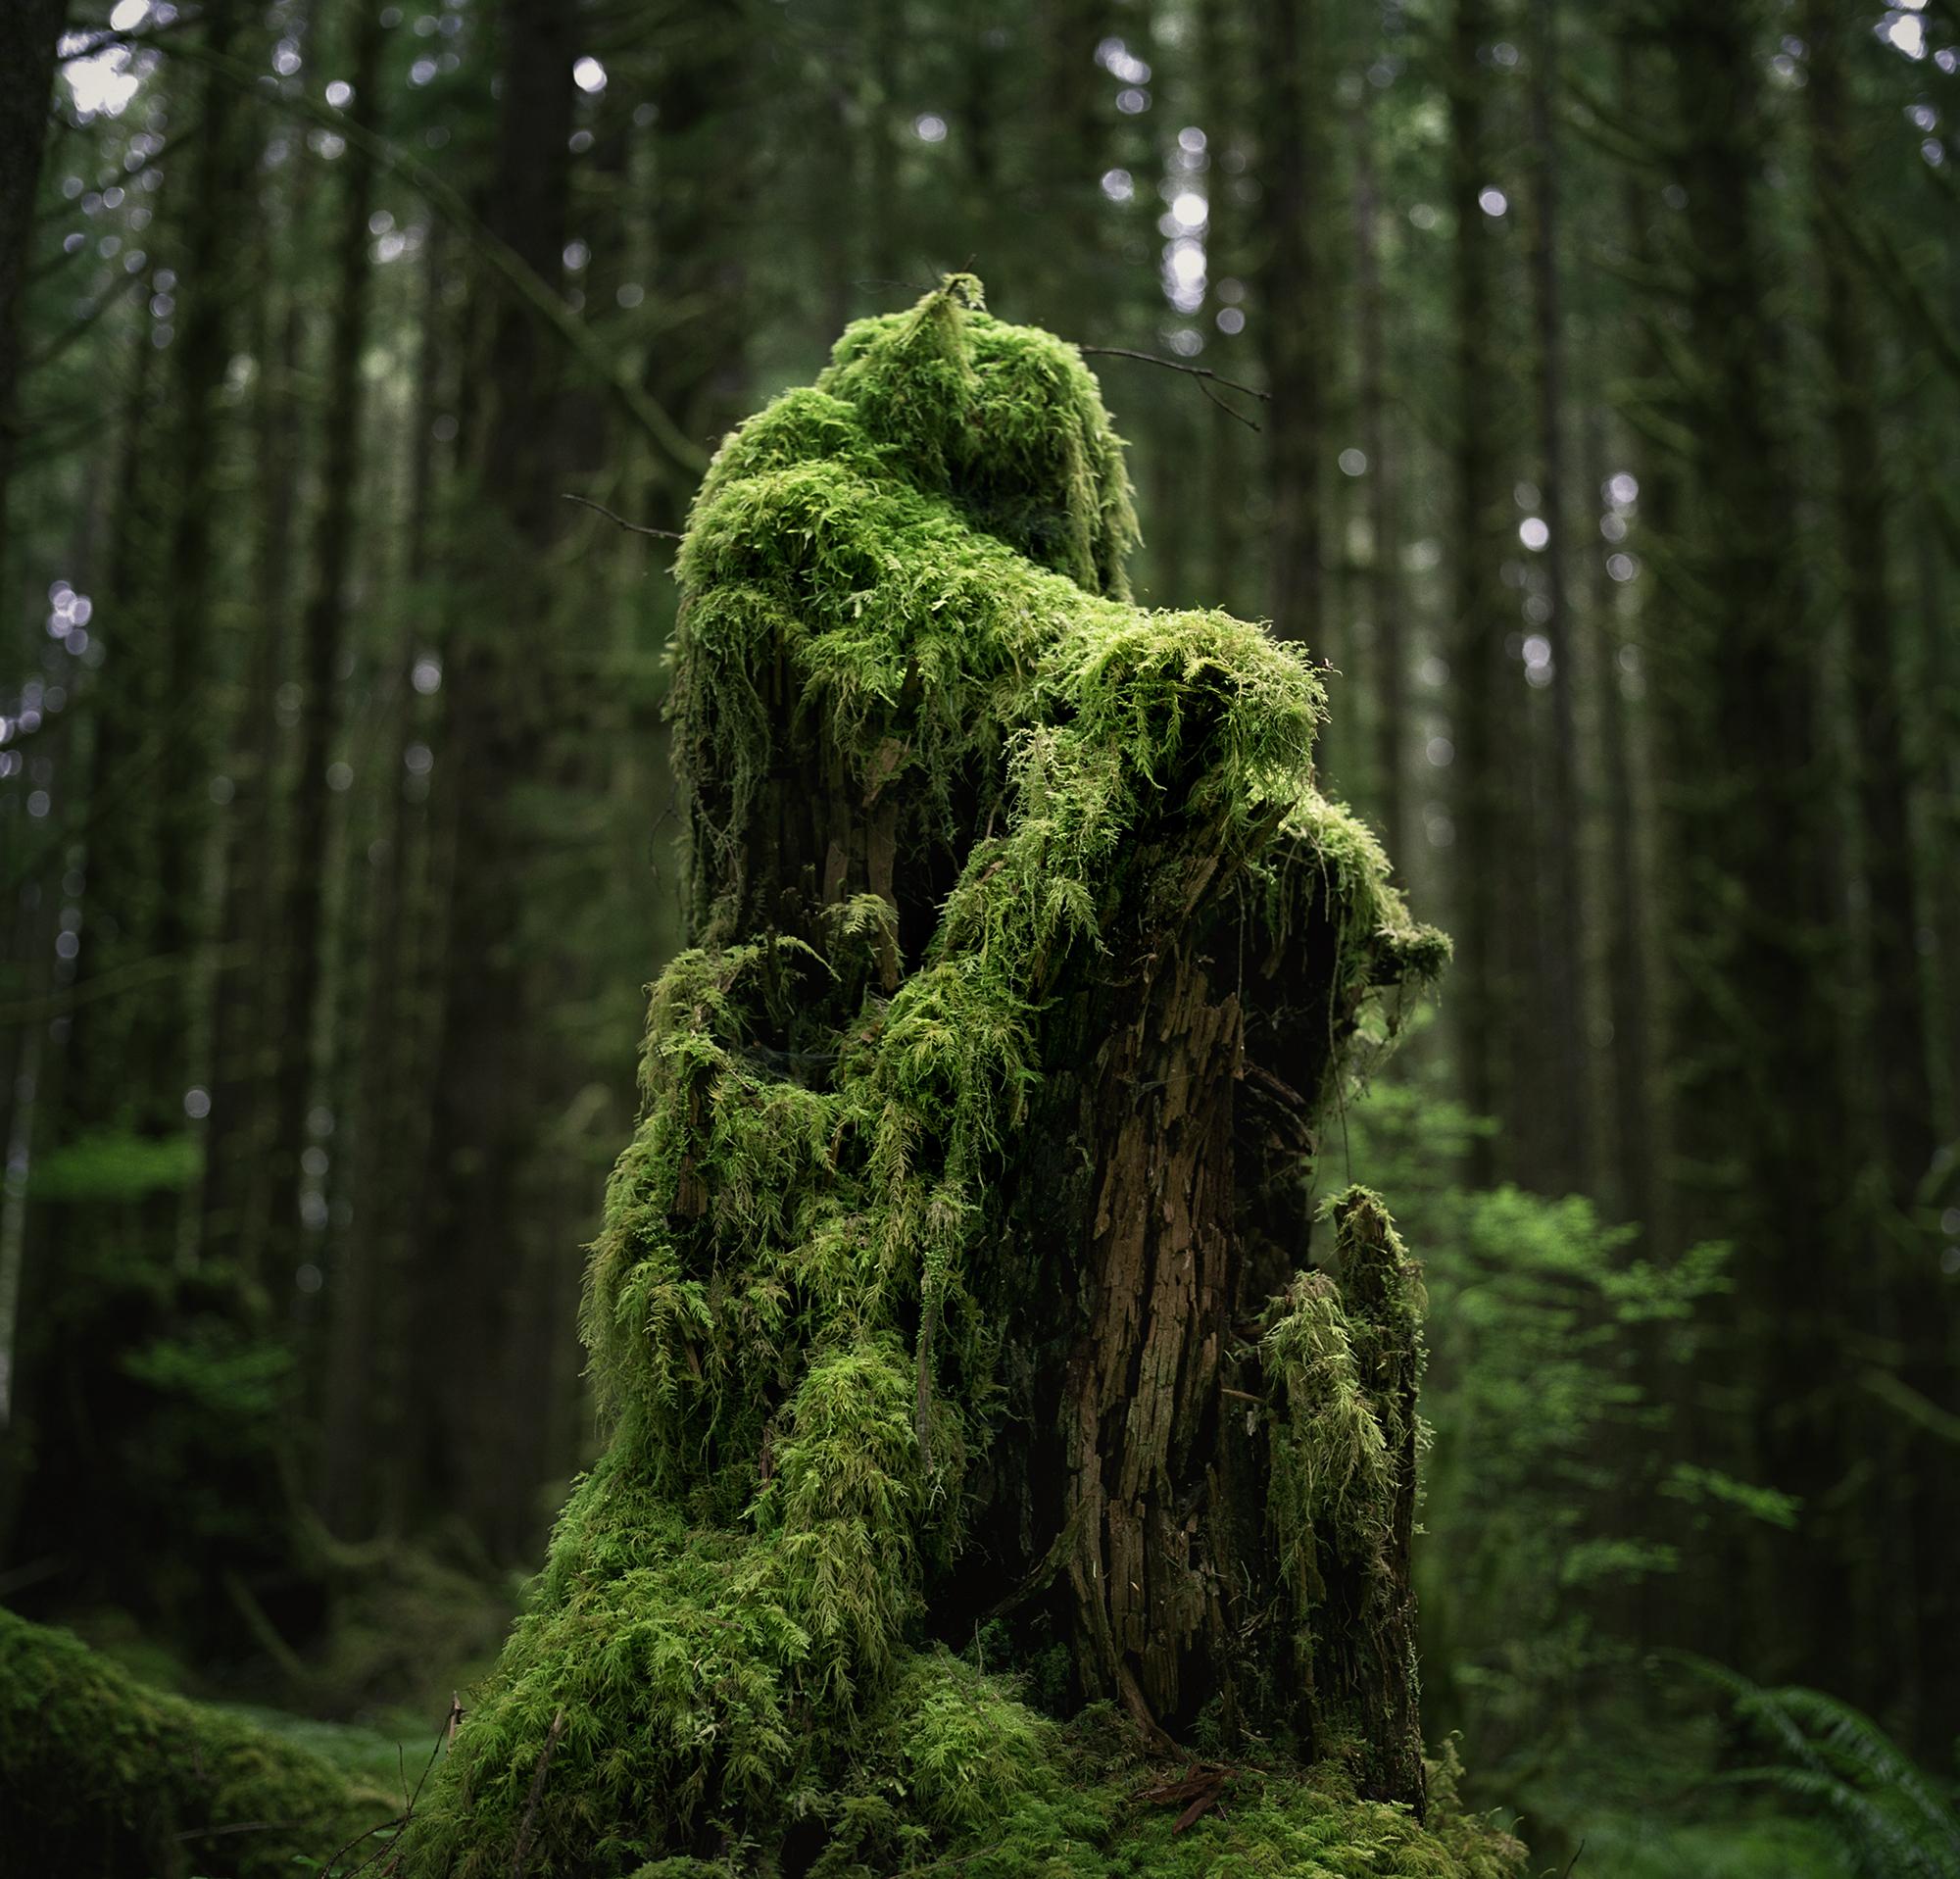 hoh stump 21v2.jpg